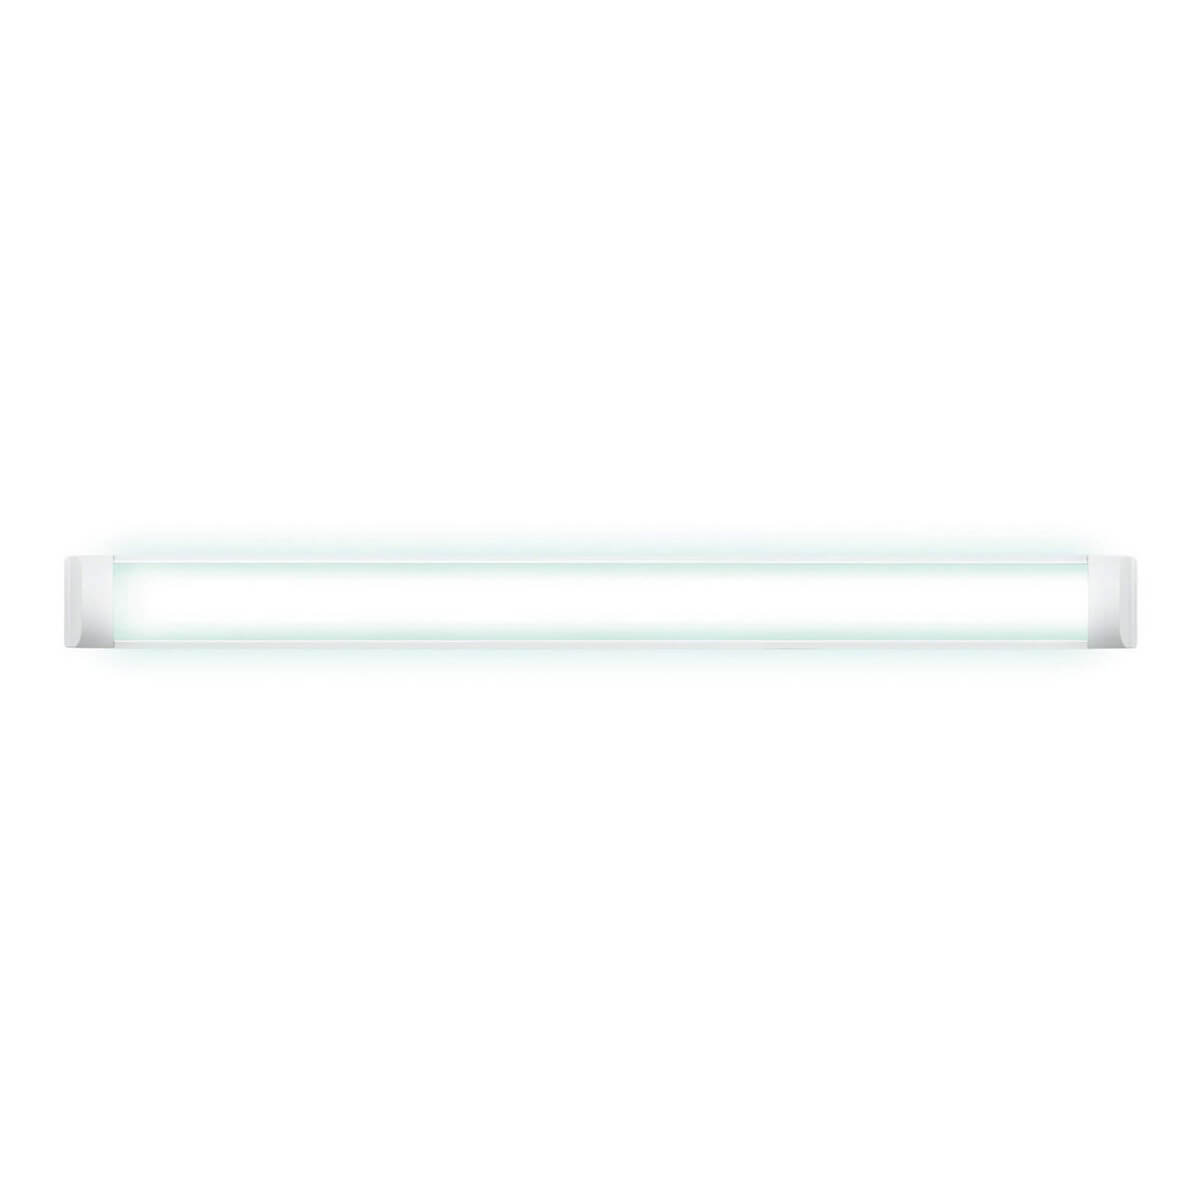 Потолочный светодиодный светильник (UL-00001797) Uniel ULO-CL60-20W/NW Silver uniel ulo zl ulozl9050wnw